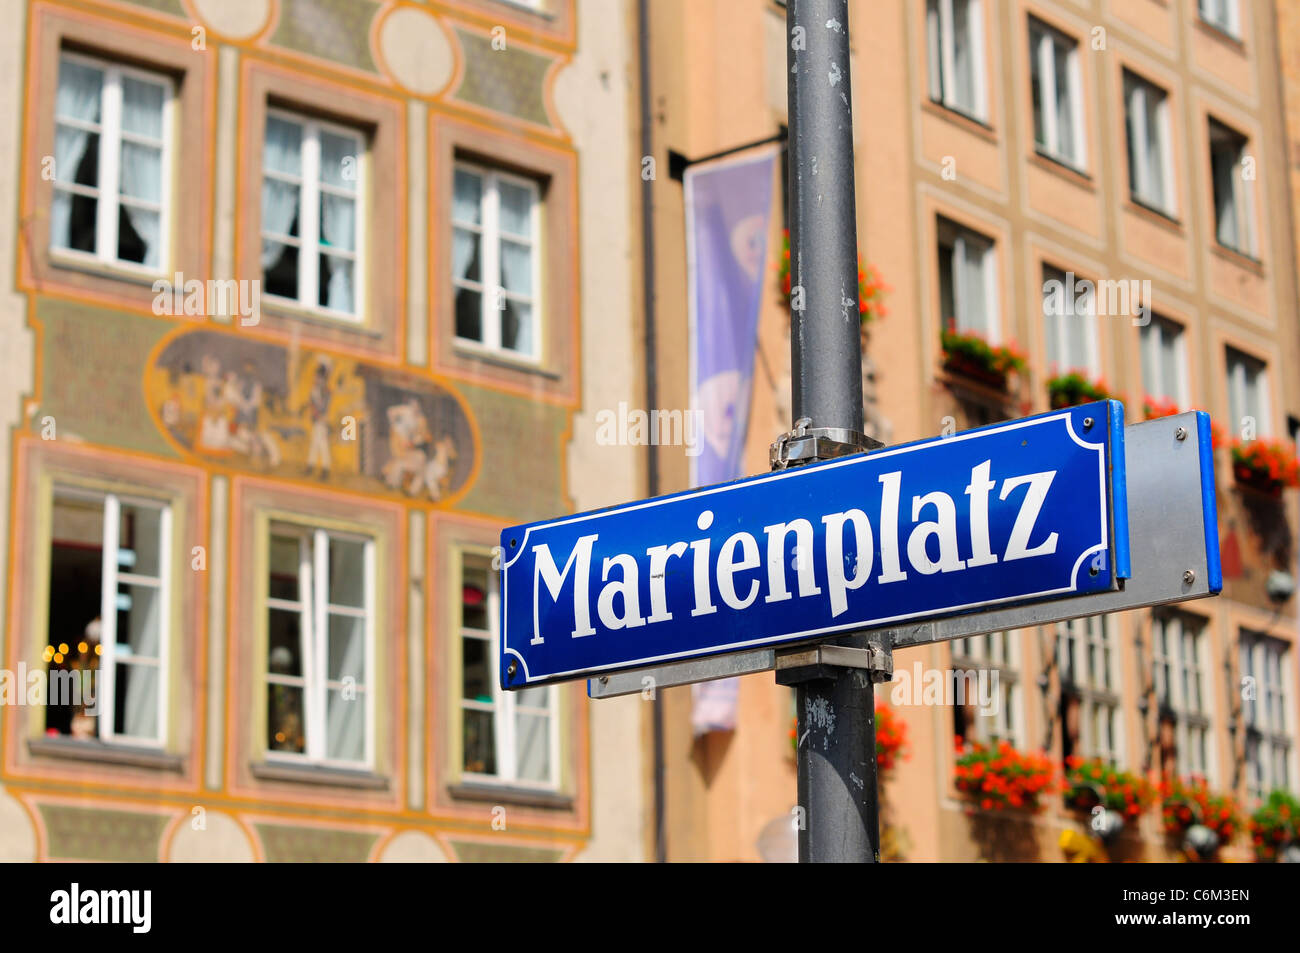 Piazza Marienplatz, Monaco di Baviera, Germania Immagini Stock